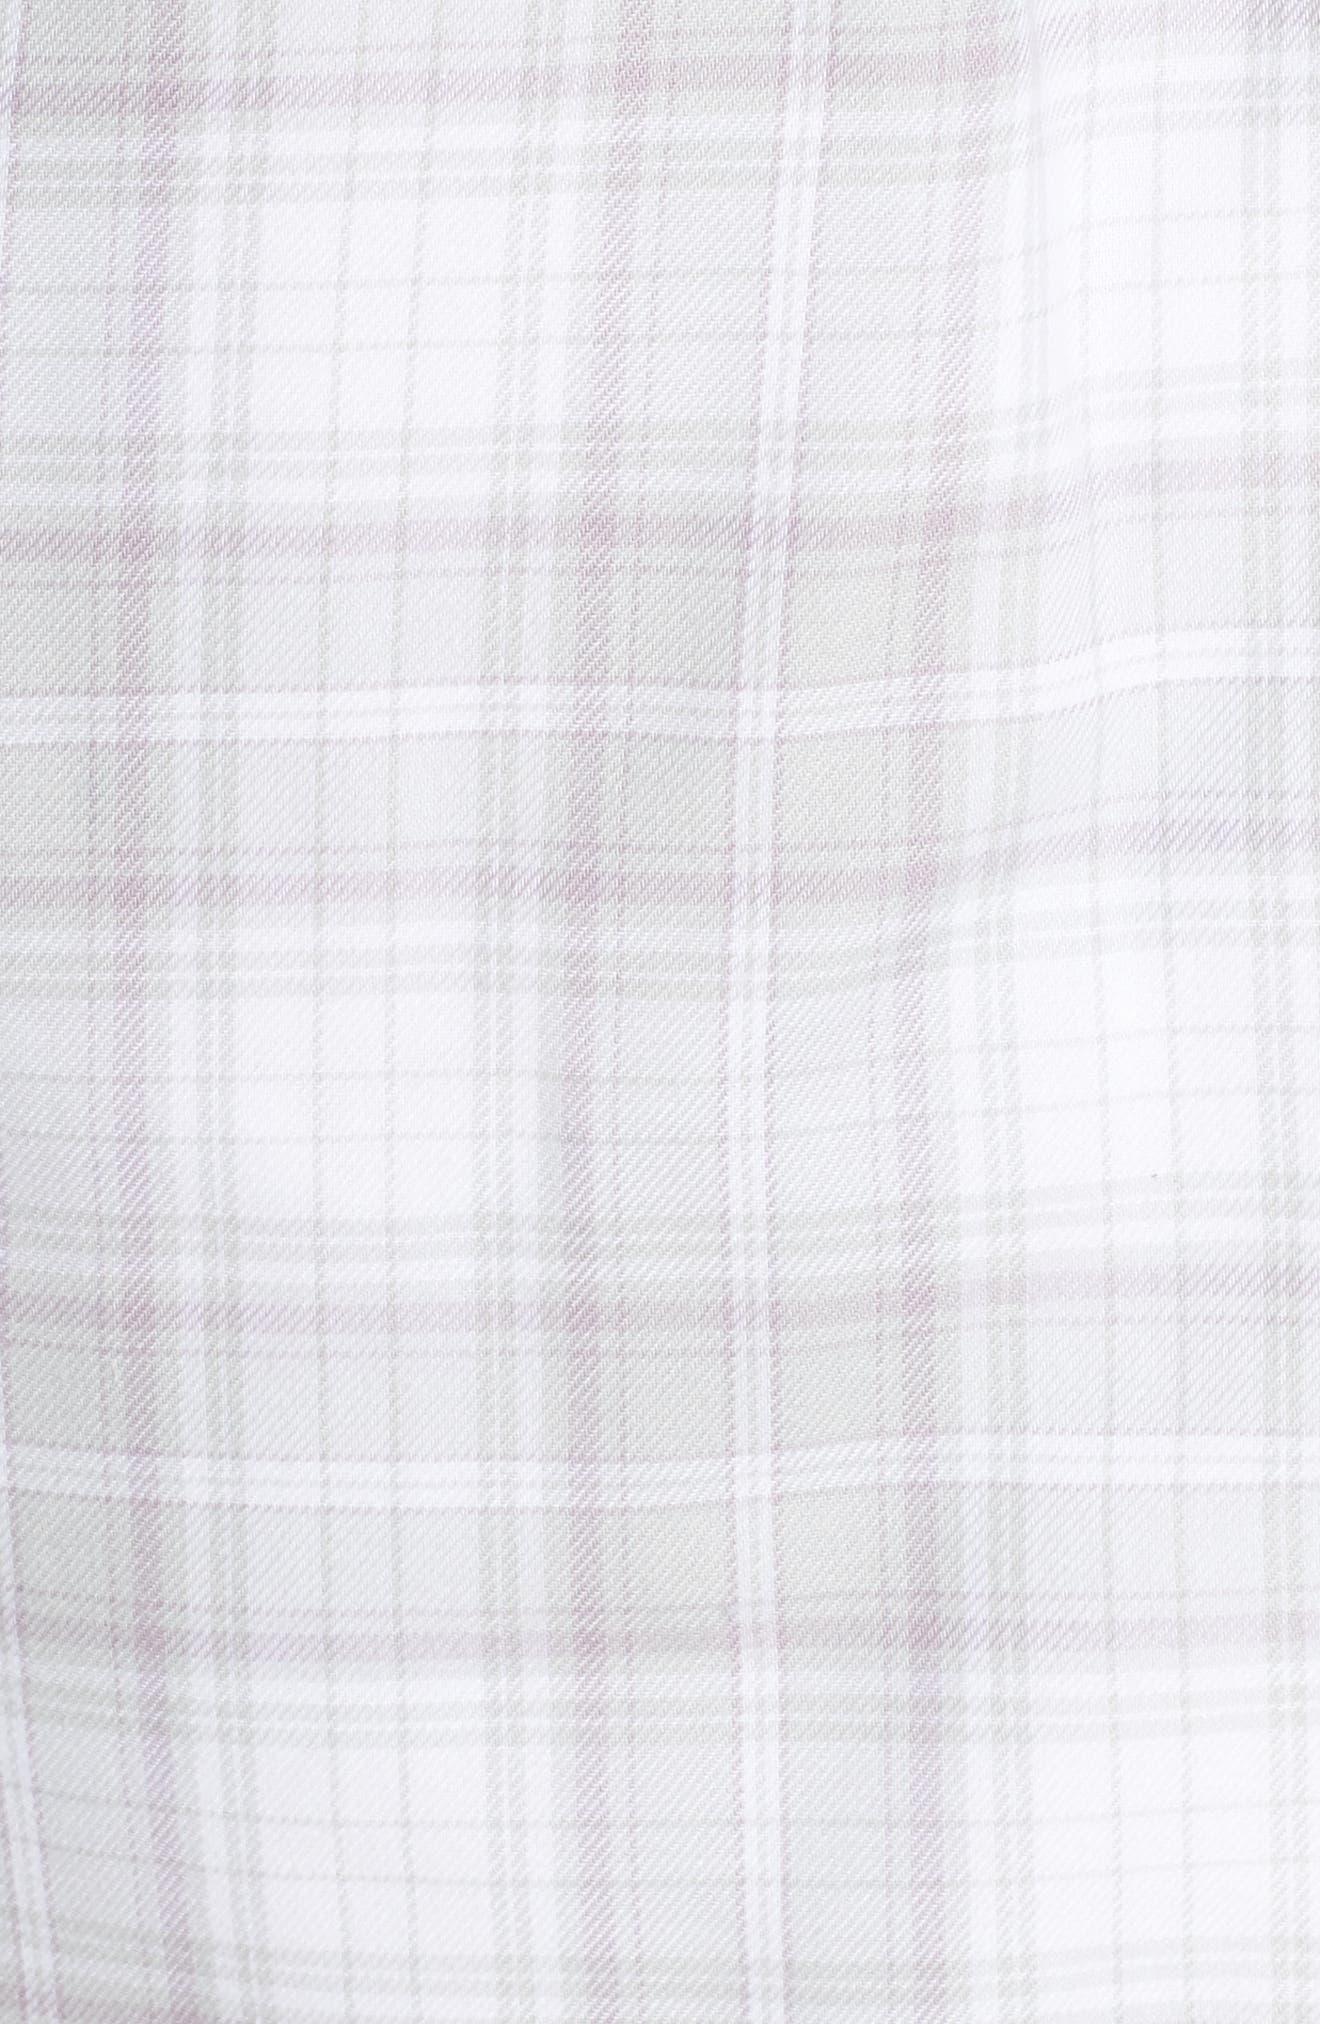 Anika Fleece Lined Flannel Robe,                             Alternate thumbnail 5, color,                             LAVENDER AURA PLAID